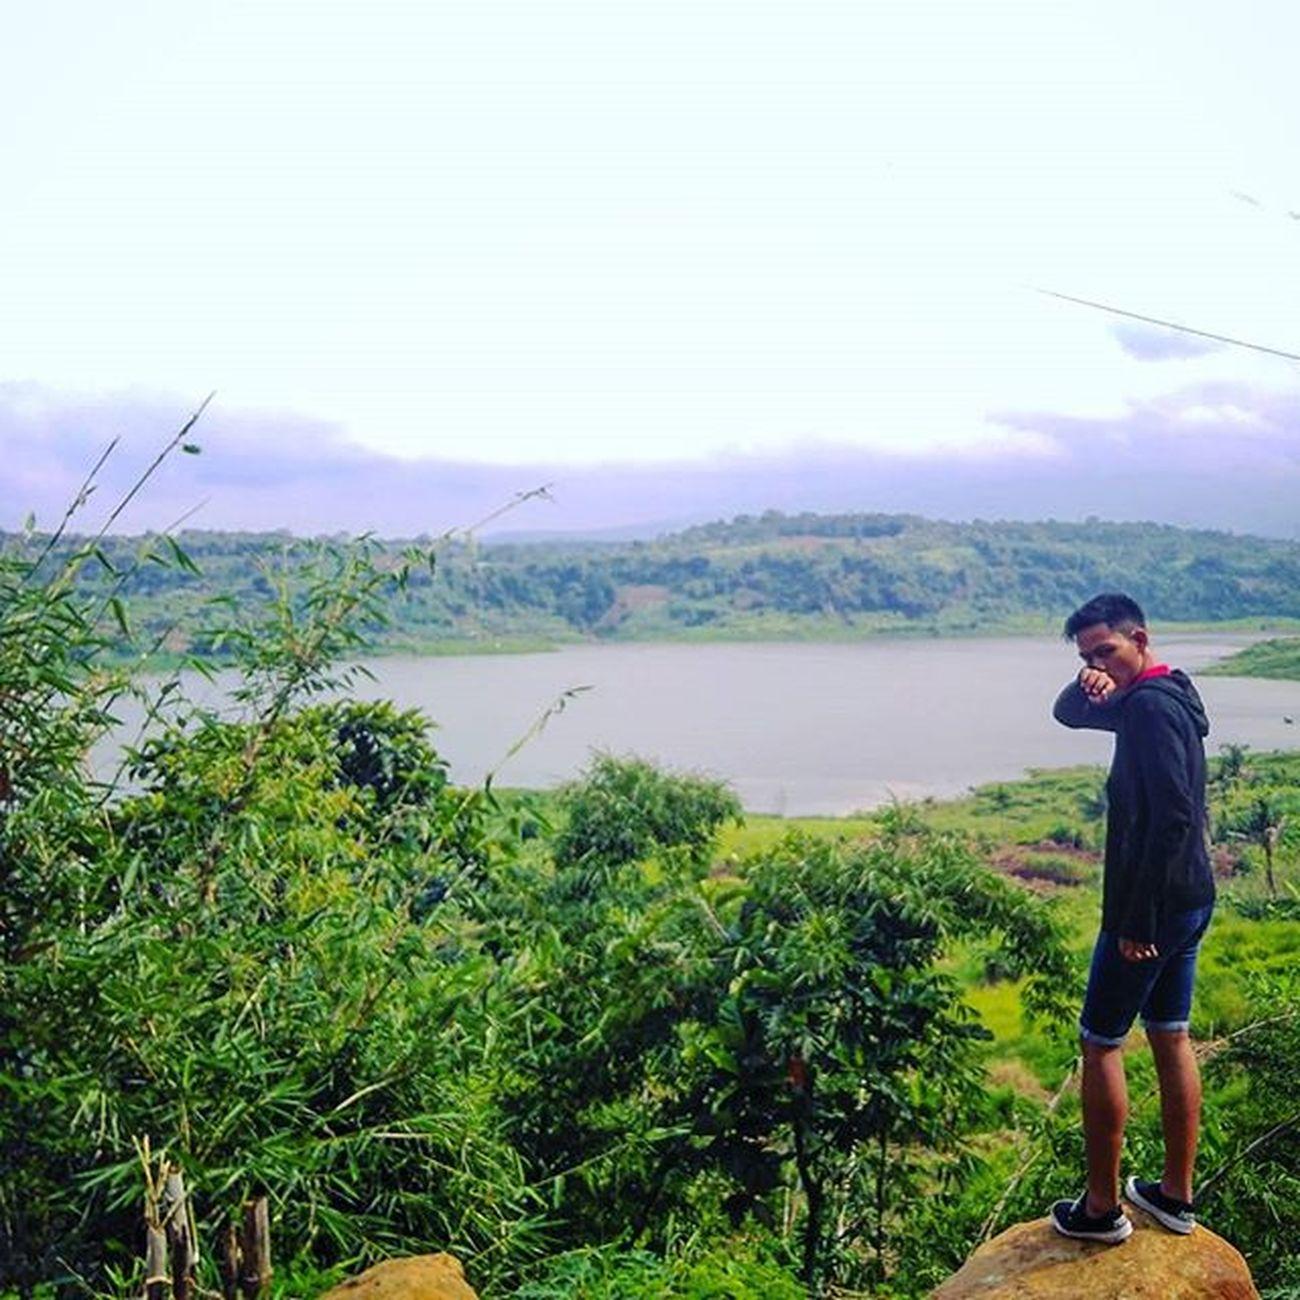 My Trip My Adventure MyTripMyAdventure Saveearth Indonesian Comeon Ootdindo Ootd Iloveearth Thanksgod Like4like Follow4follow Galerisemarang